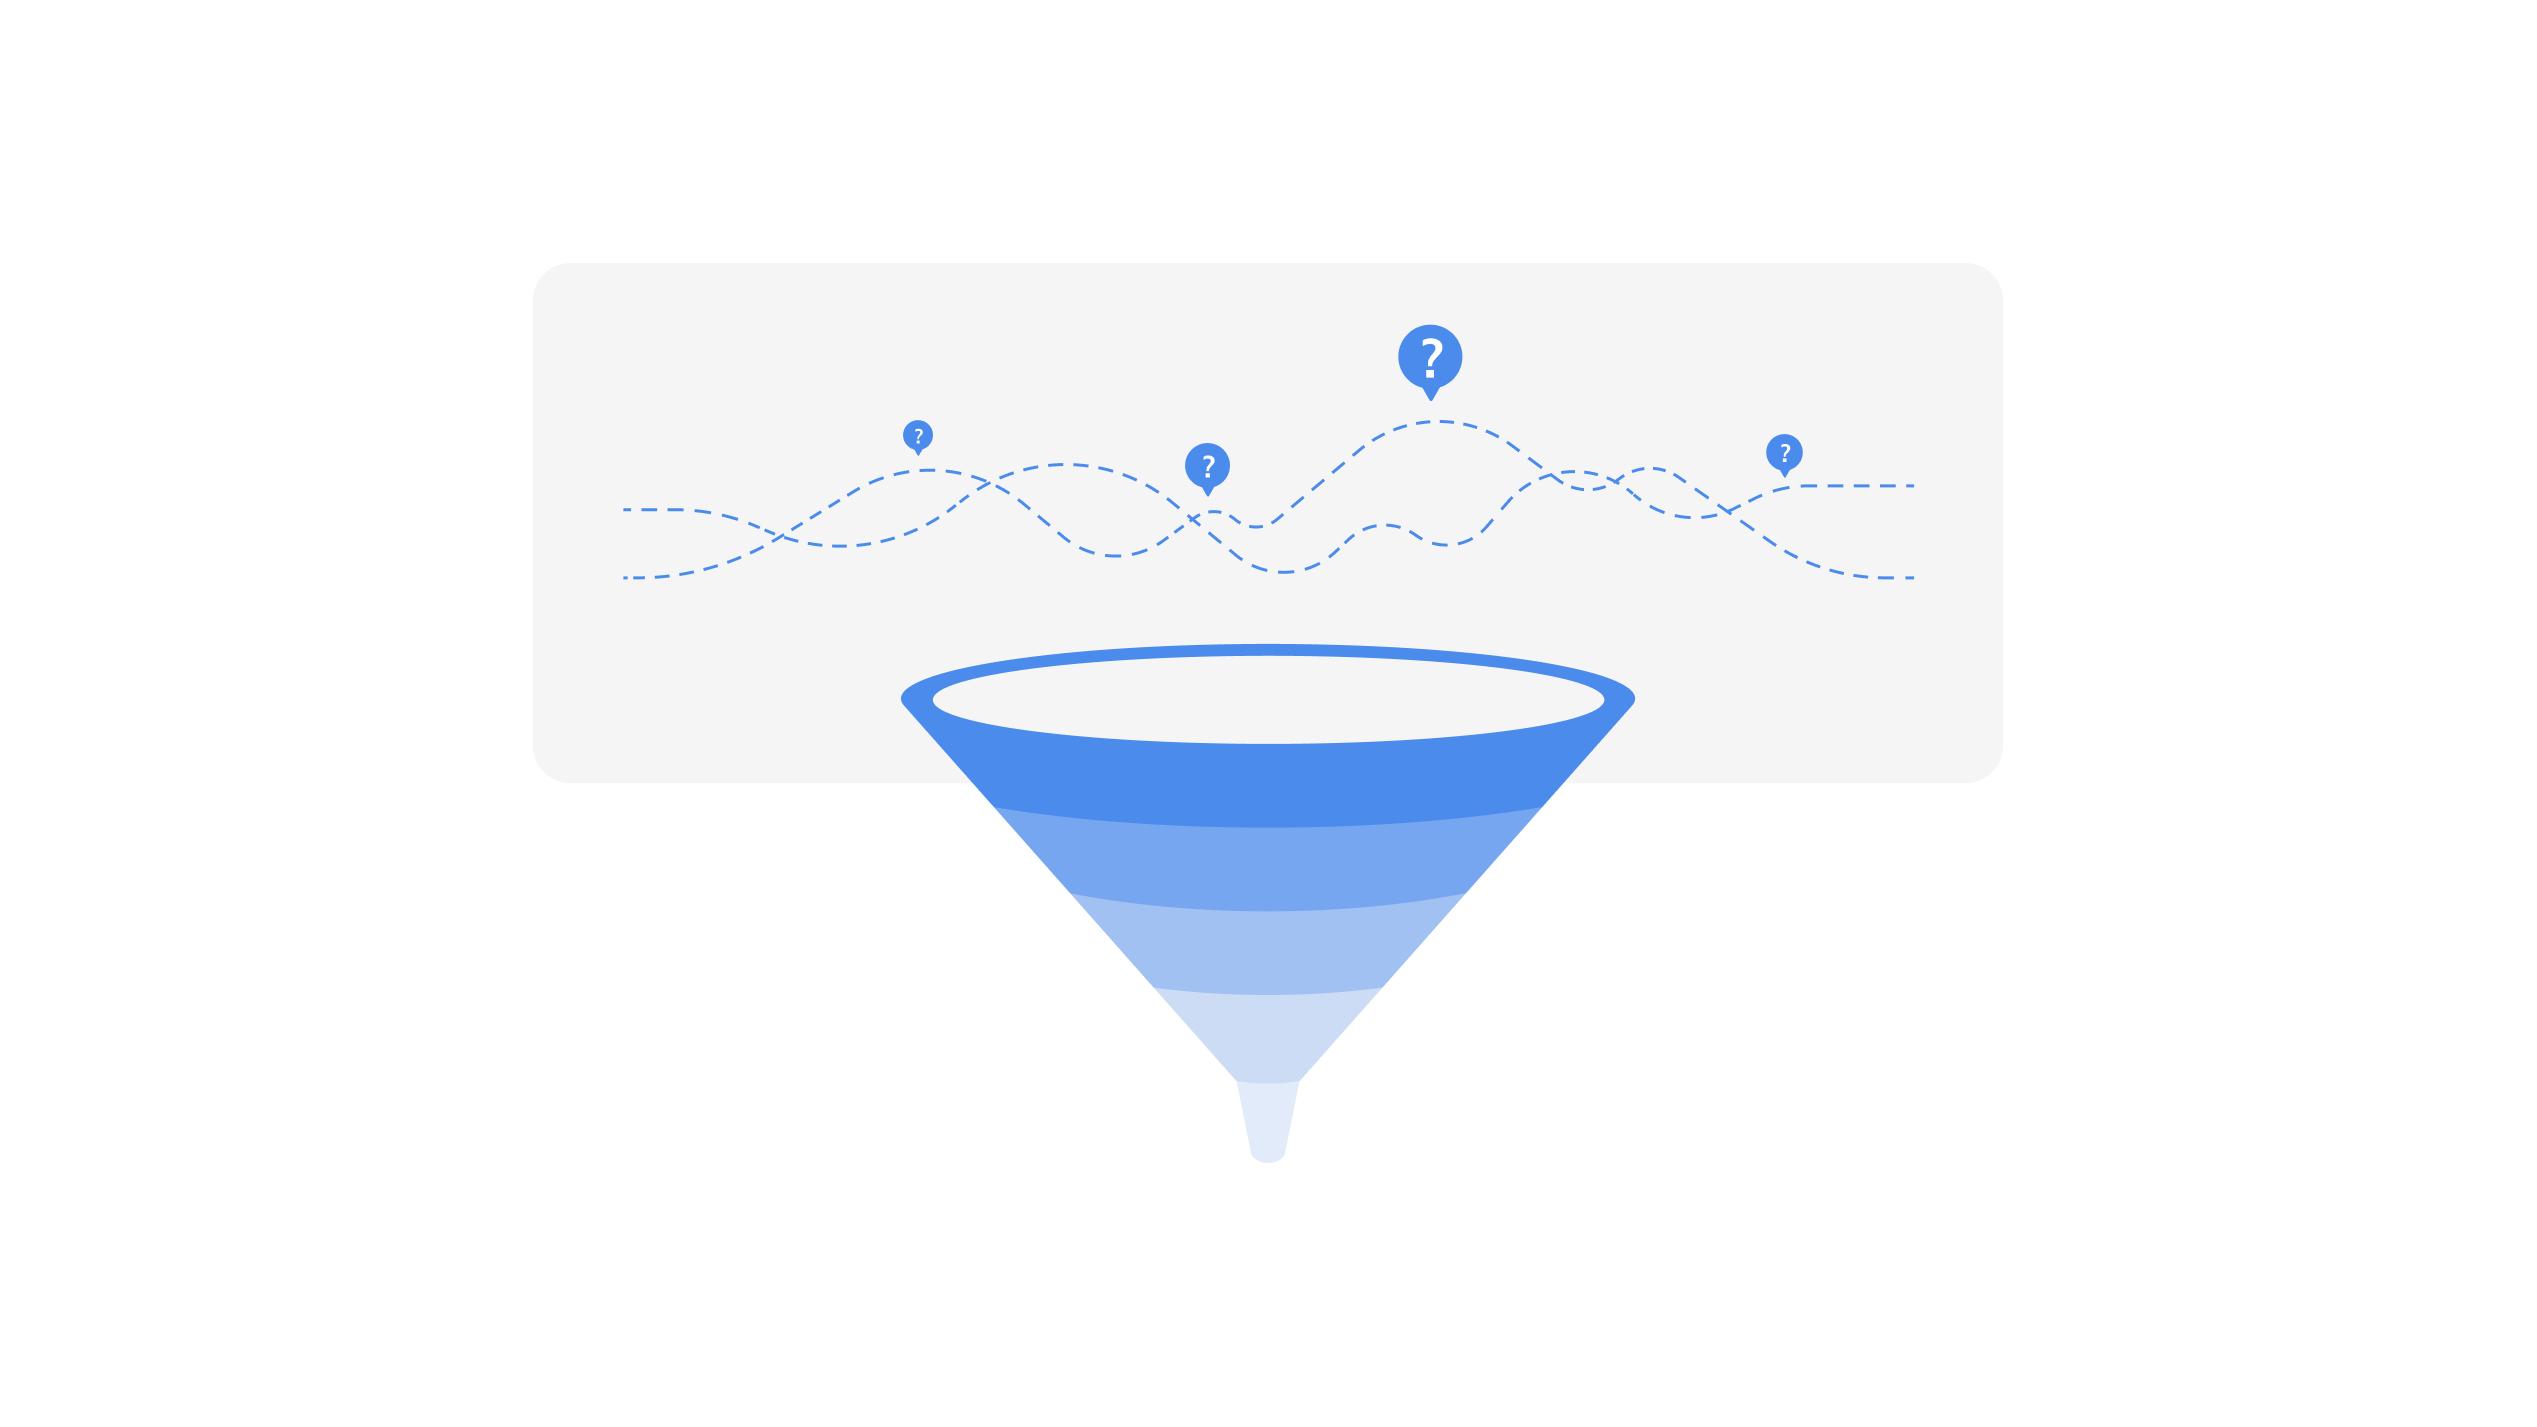 saas funnel value prediction for start ups